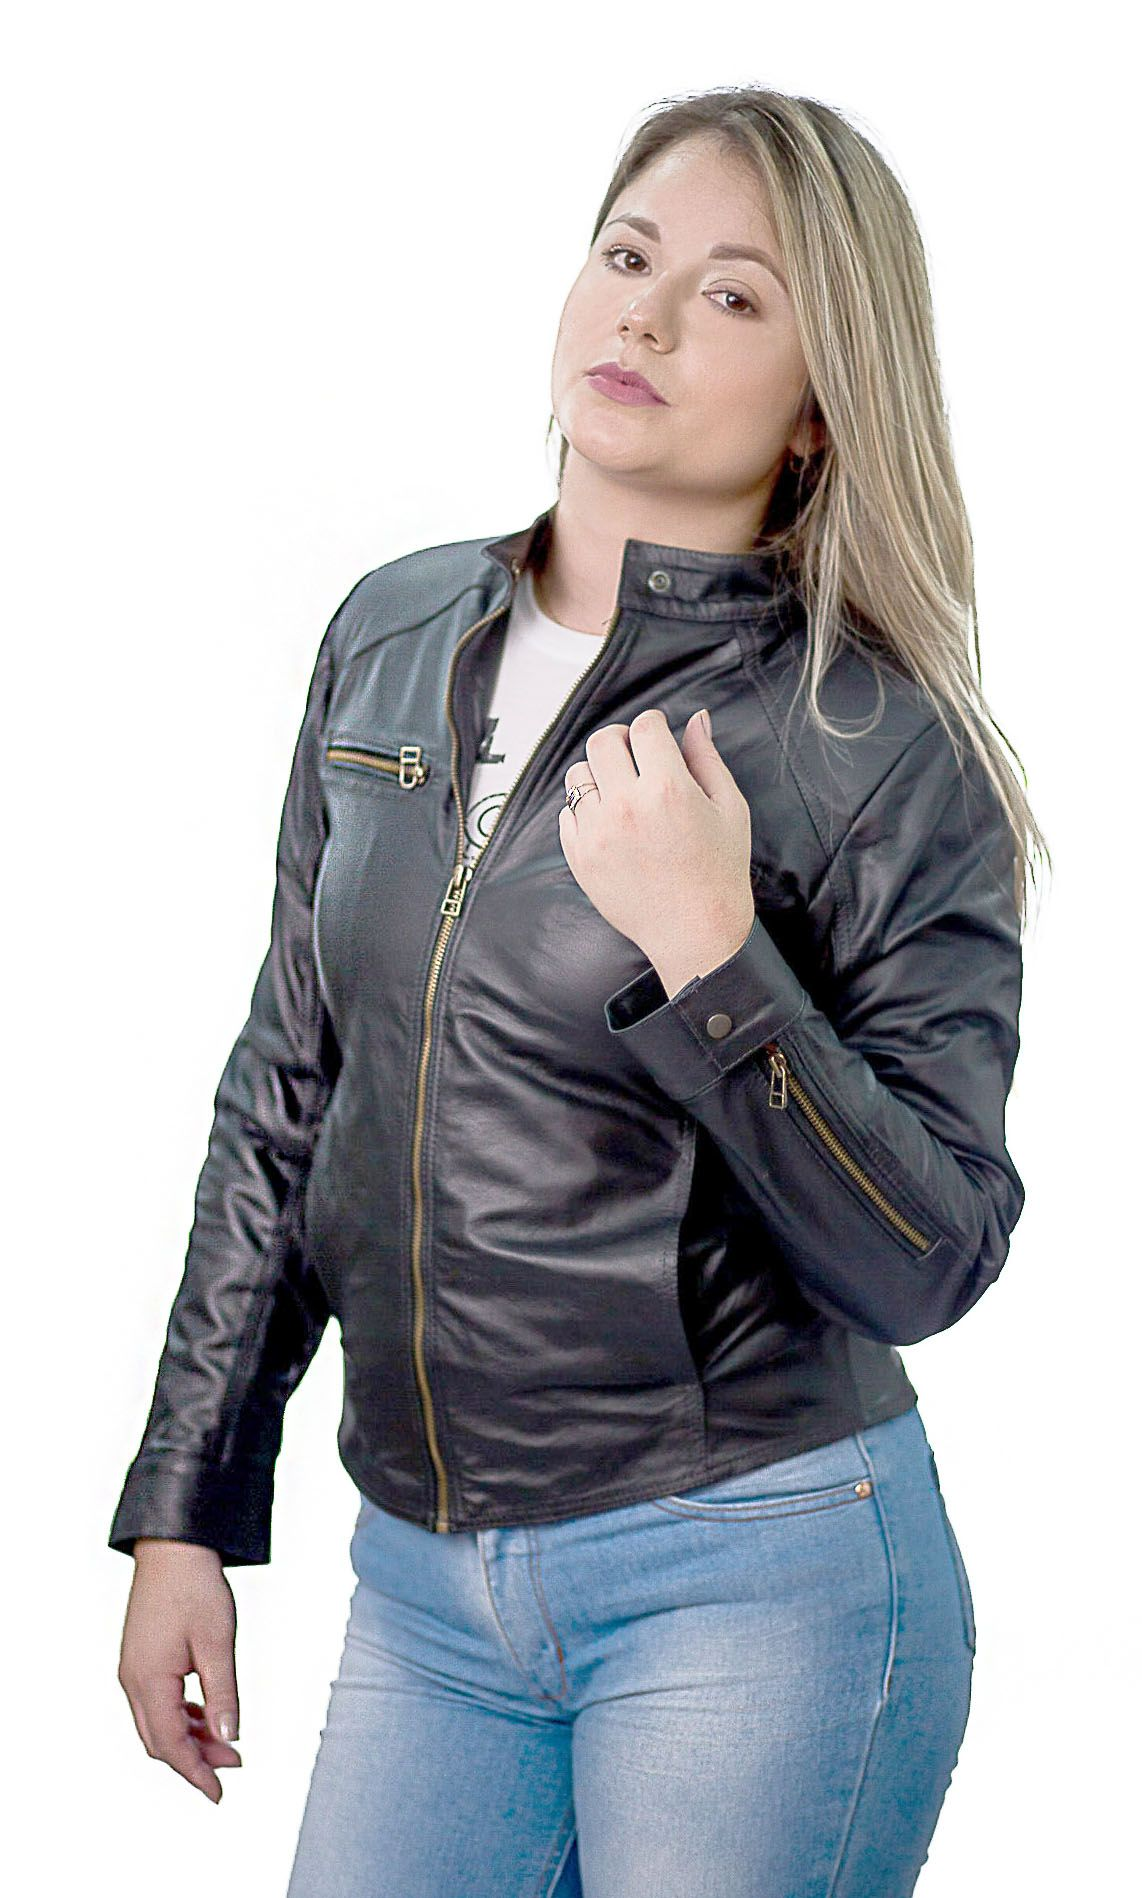 Jaqueta Feminina Prata Couro 107 Preta